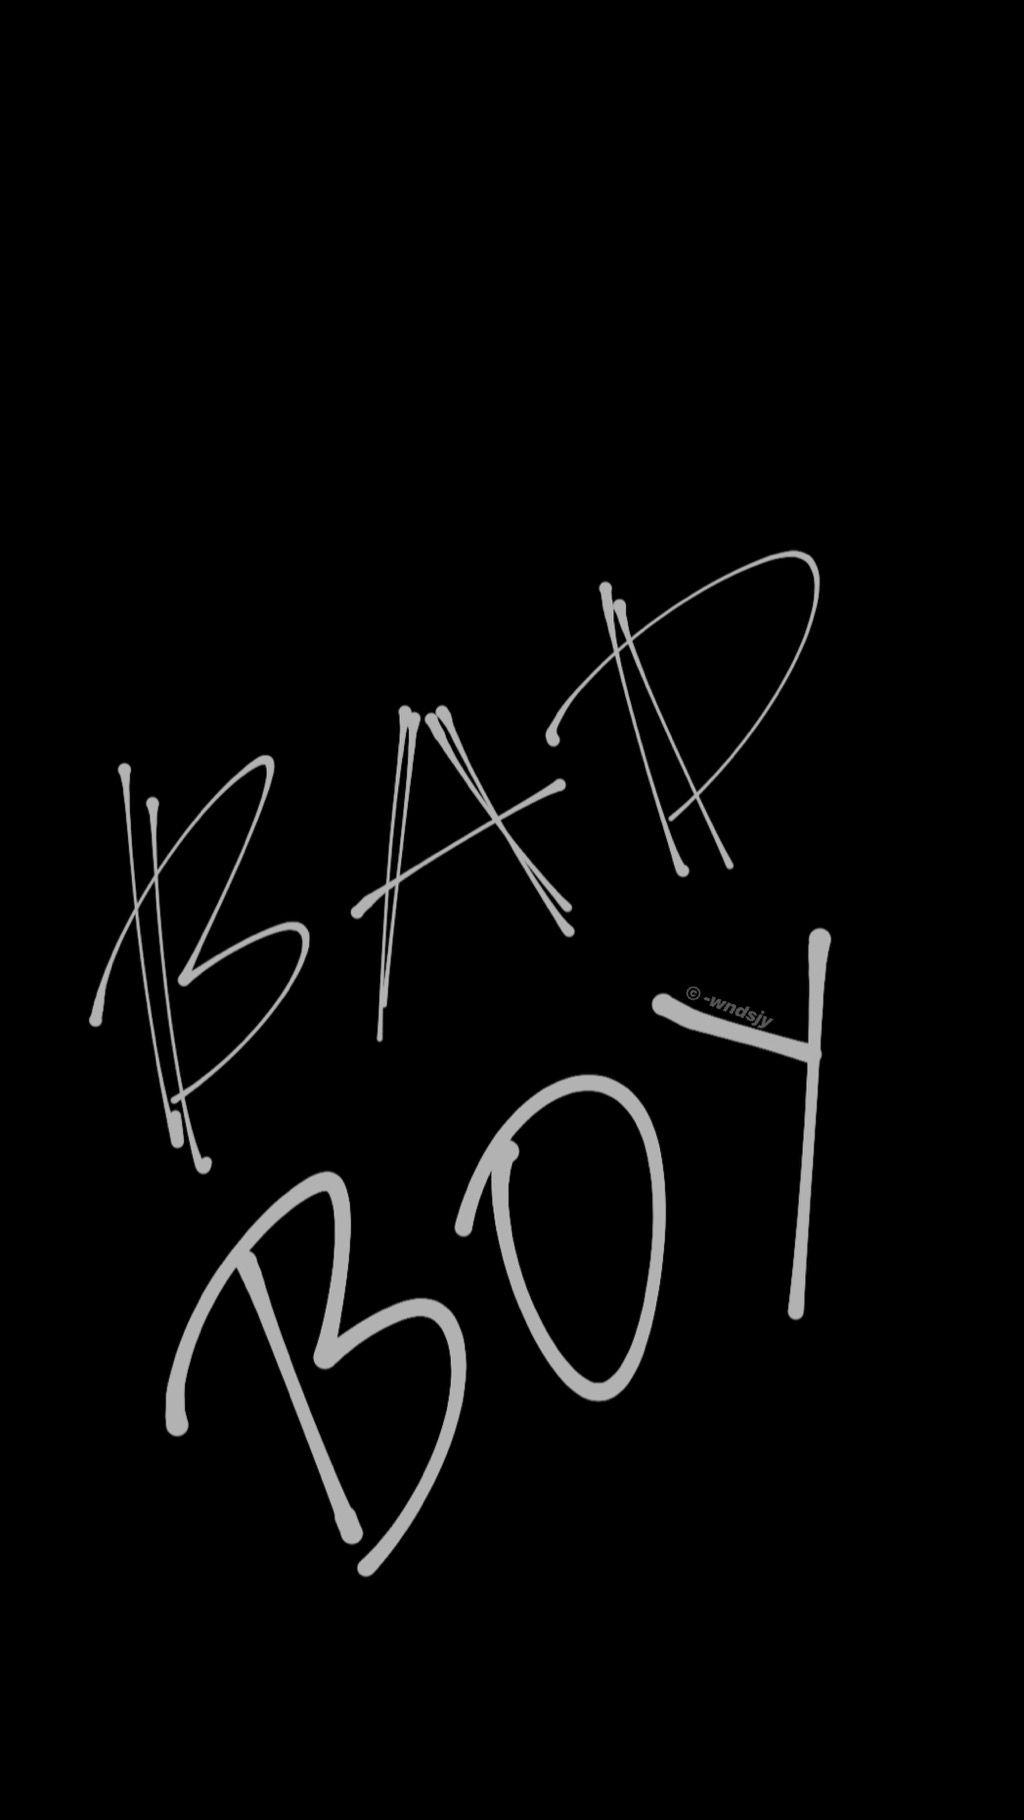 Save Use More Follow Me Boy wallpaper Black Bad Boy Area Boys 1024x1820